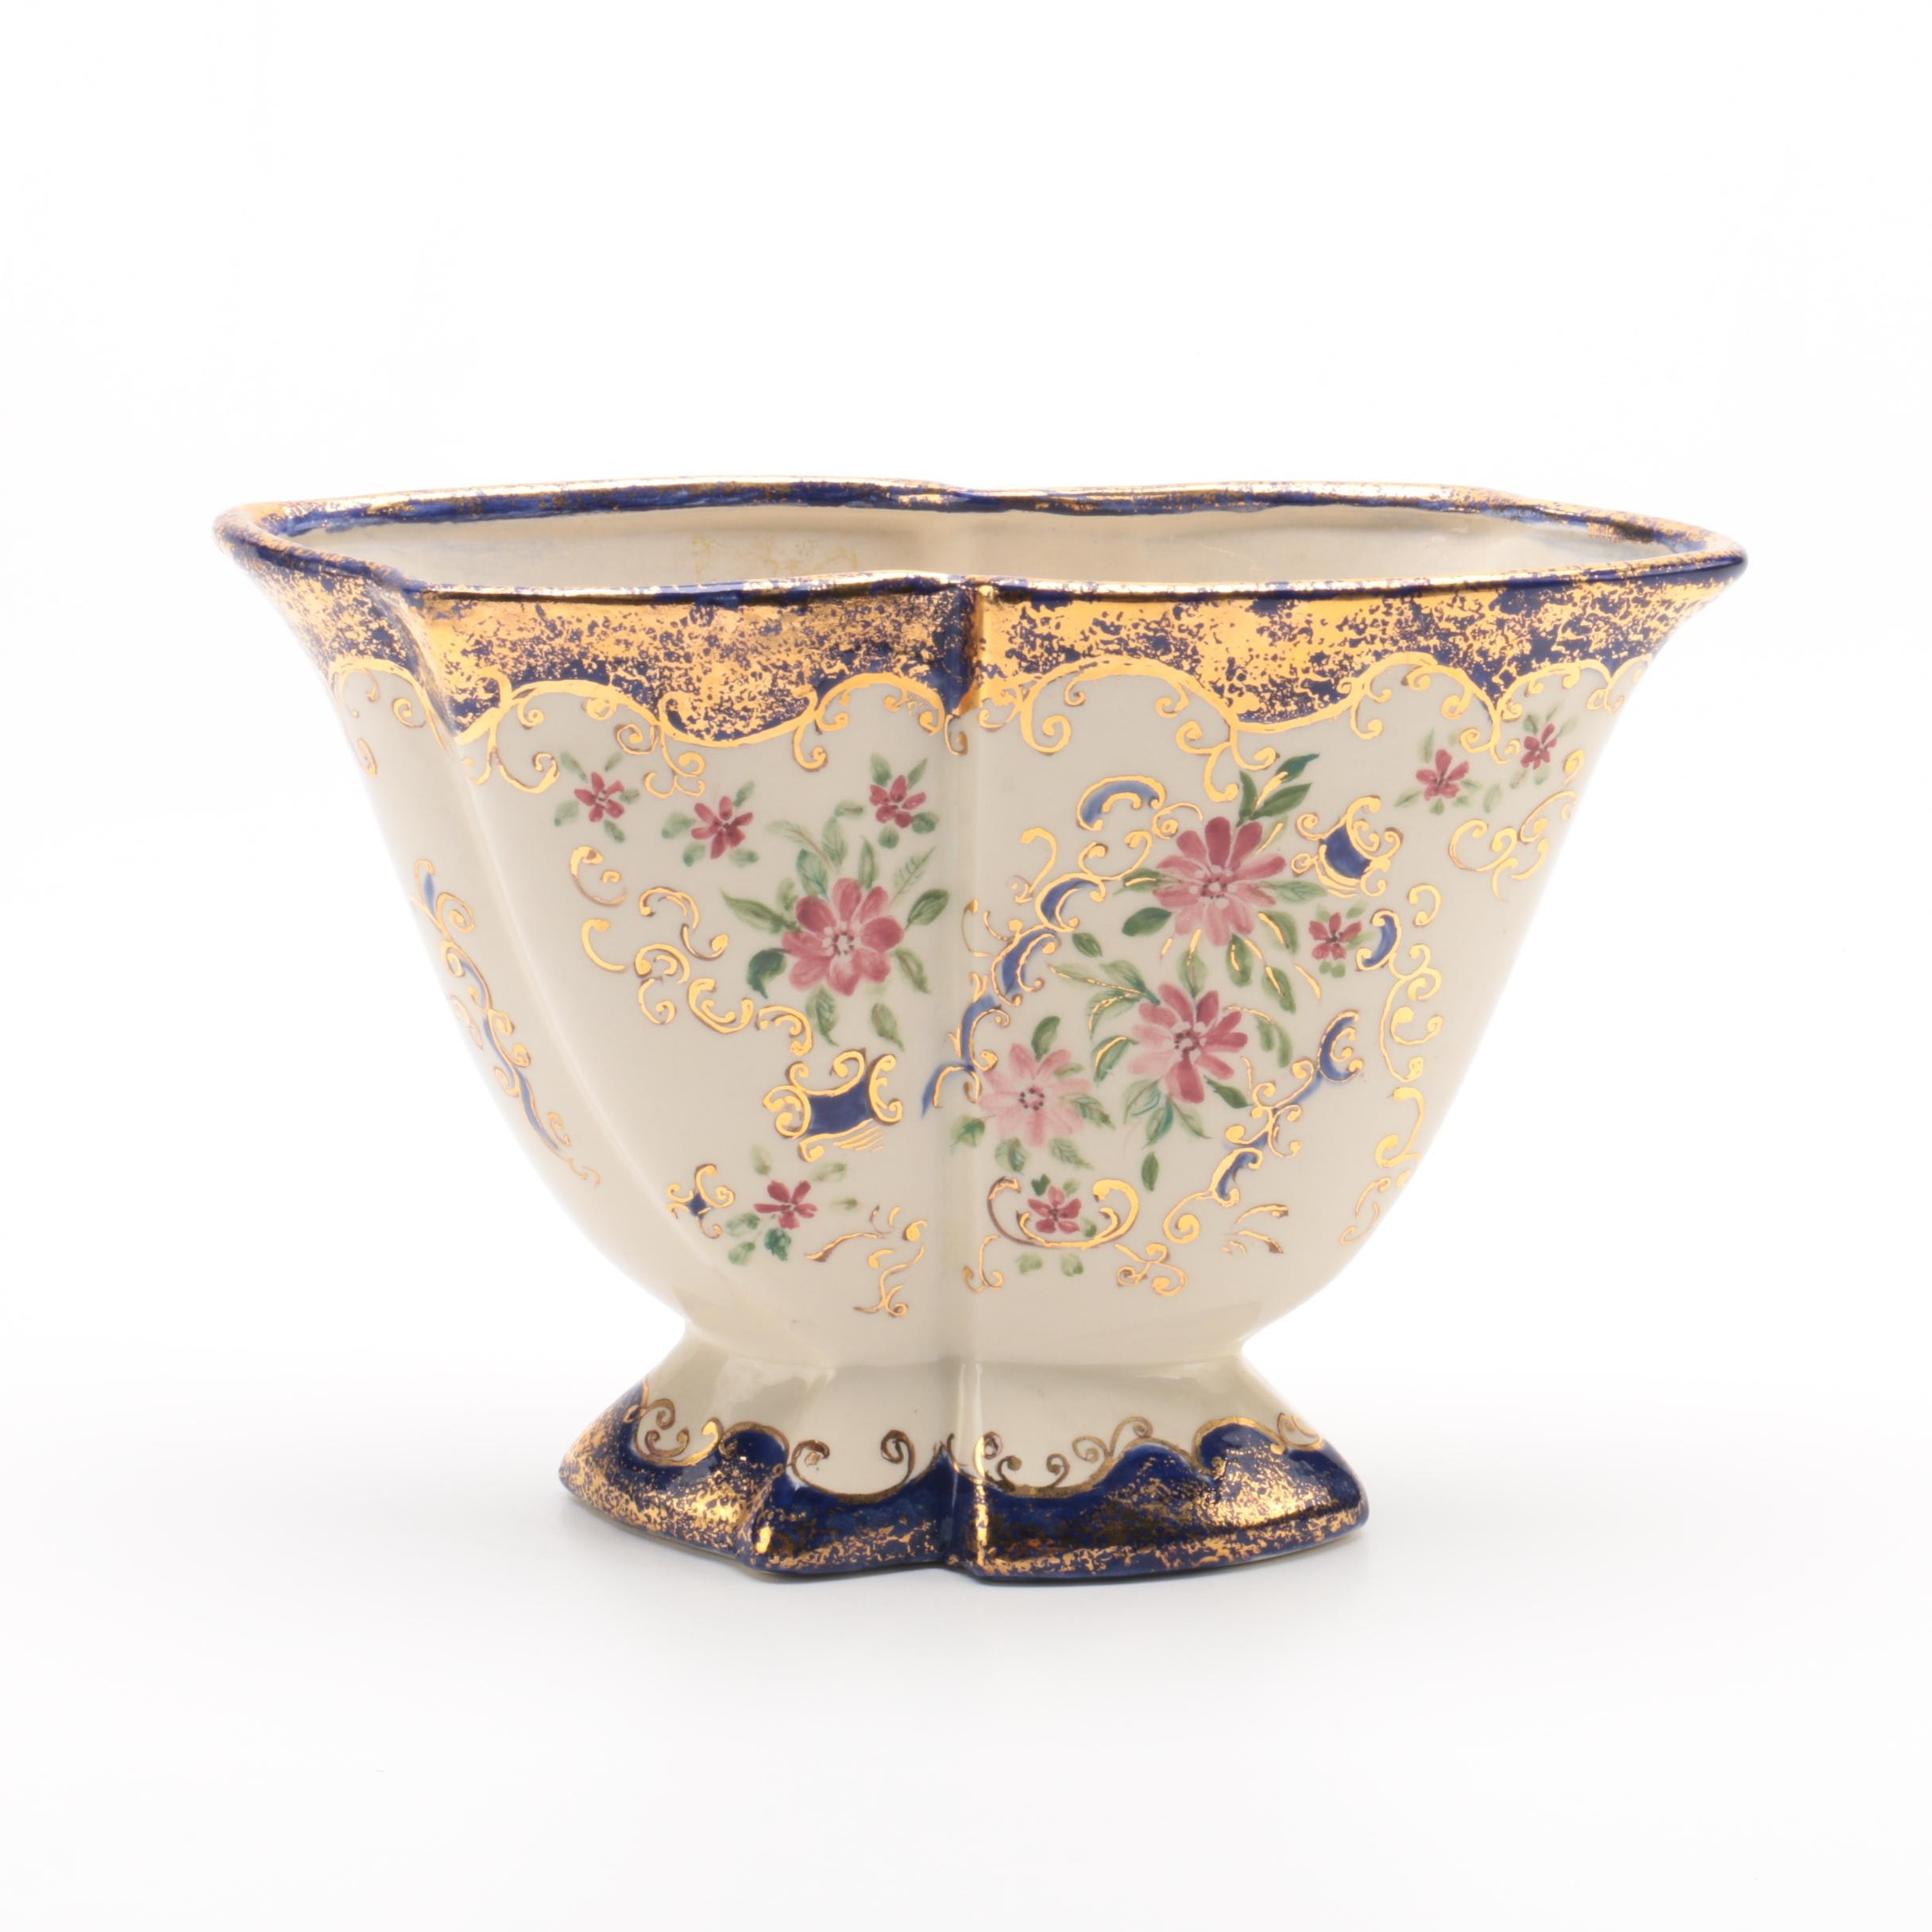 Hand-Painted Porcelain Vase Signed K. Townley